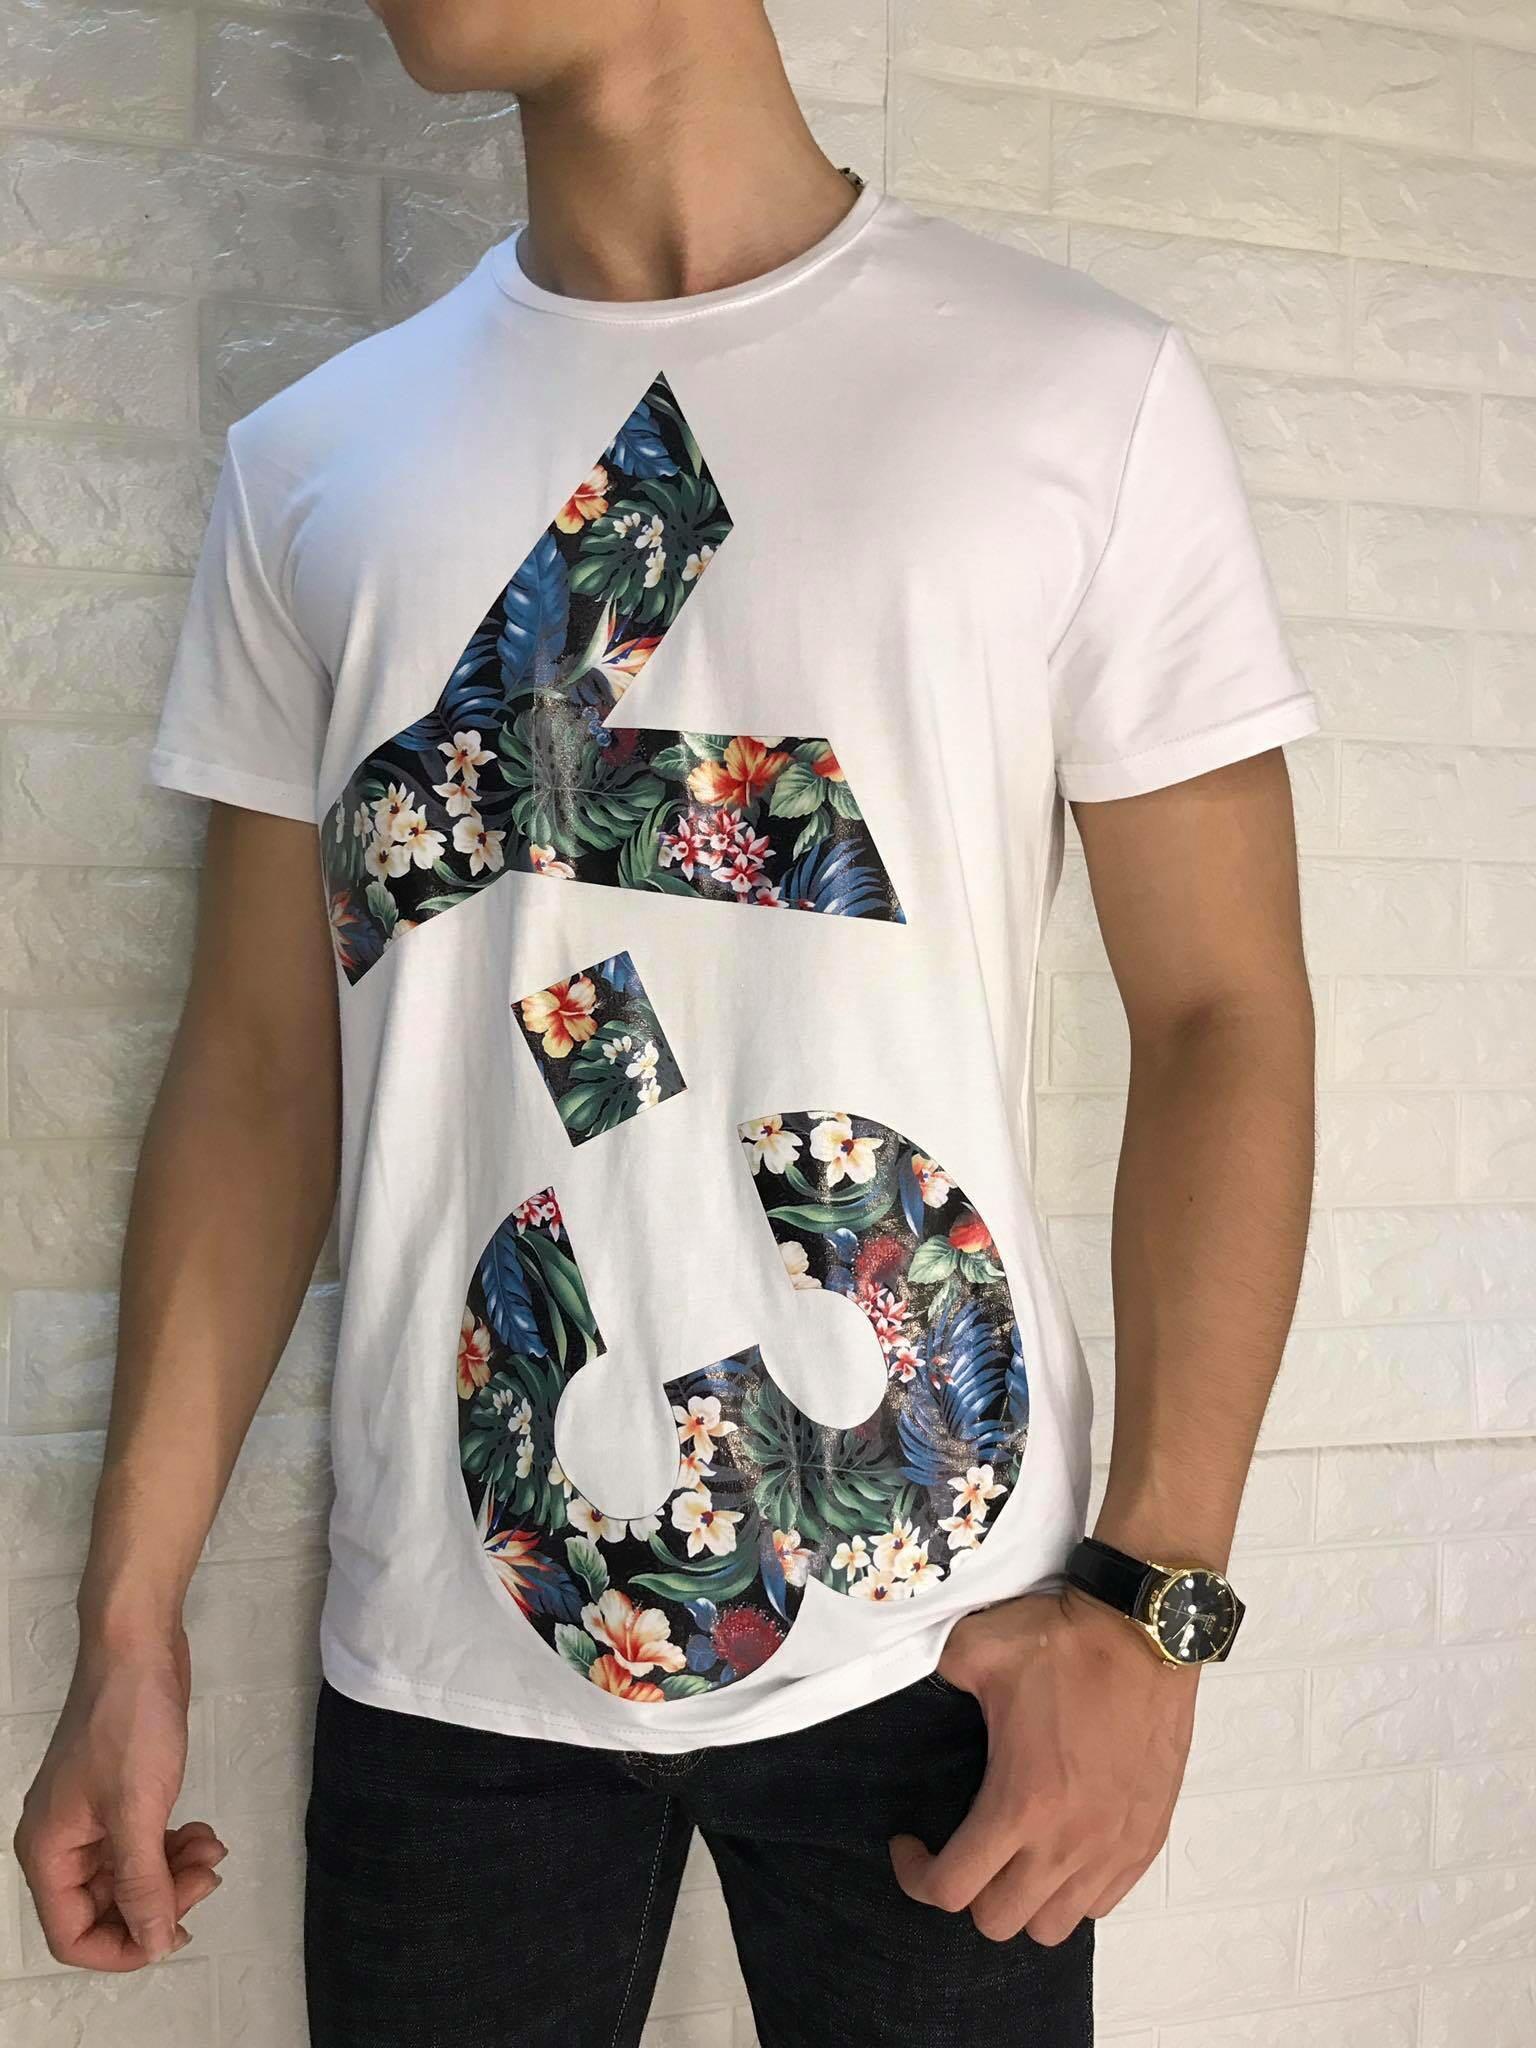 s www sendo vn dep de xuong dap hinh chim cuc xinh 61811556183685 Rapper Shirts For Sale #2